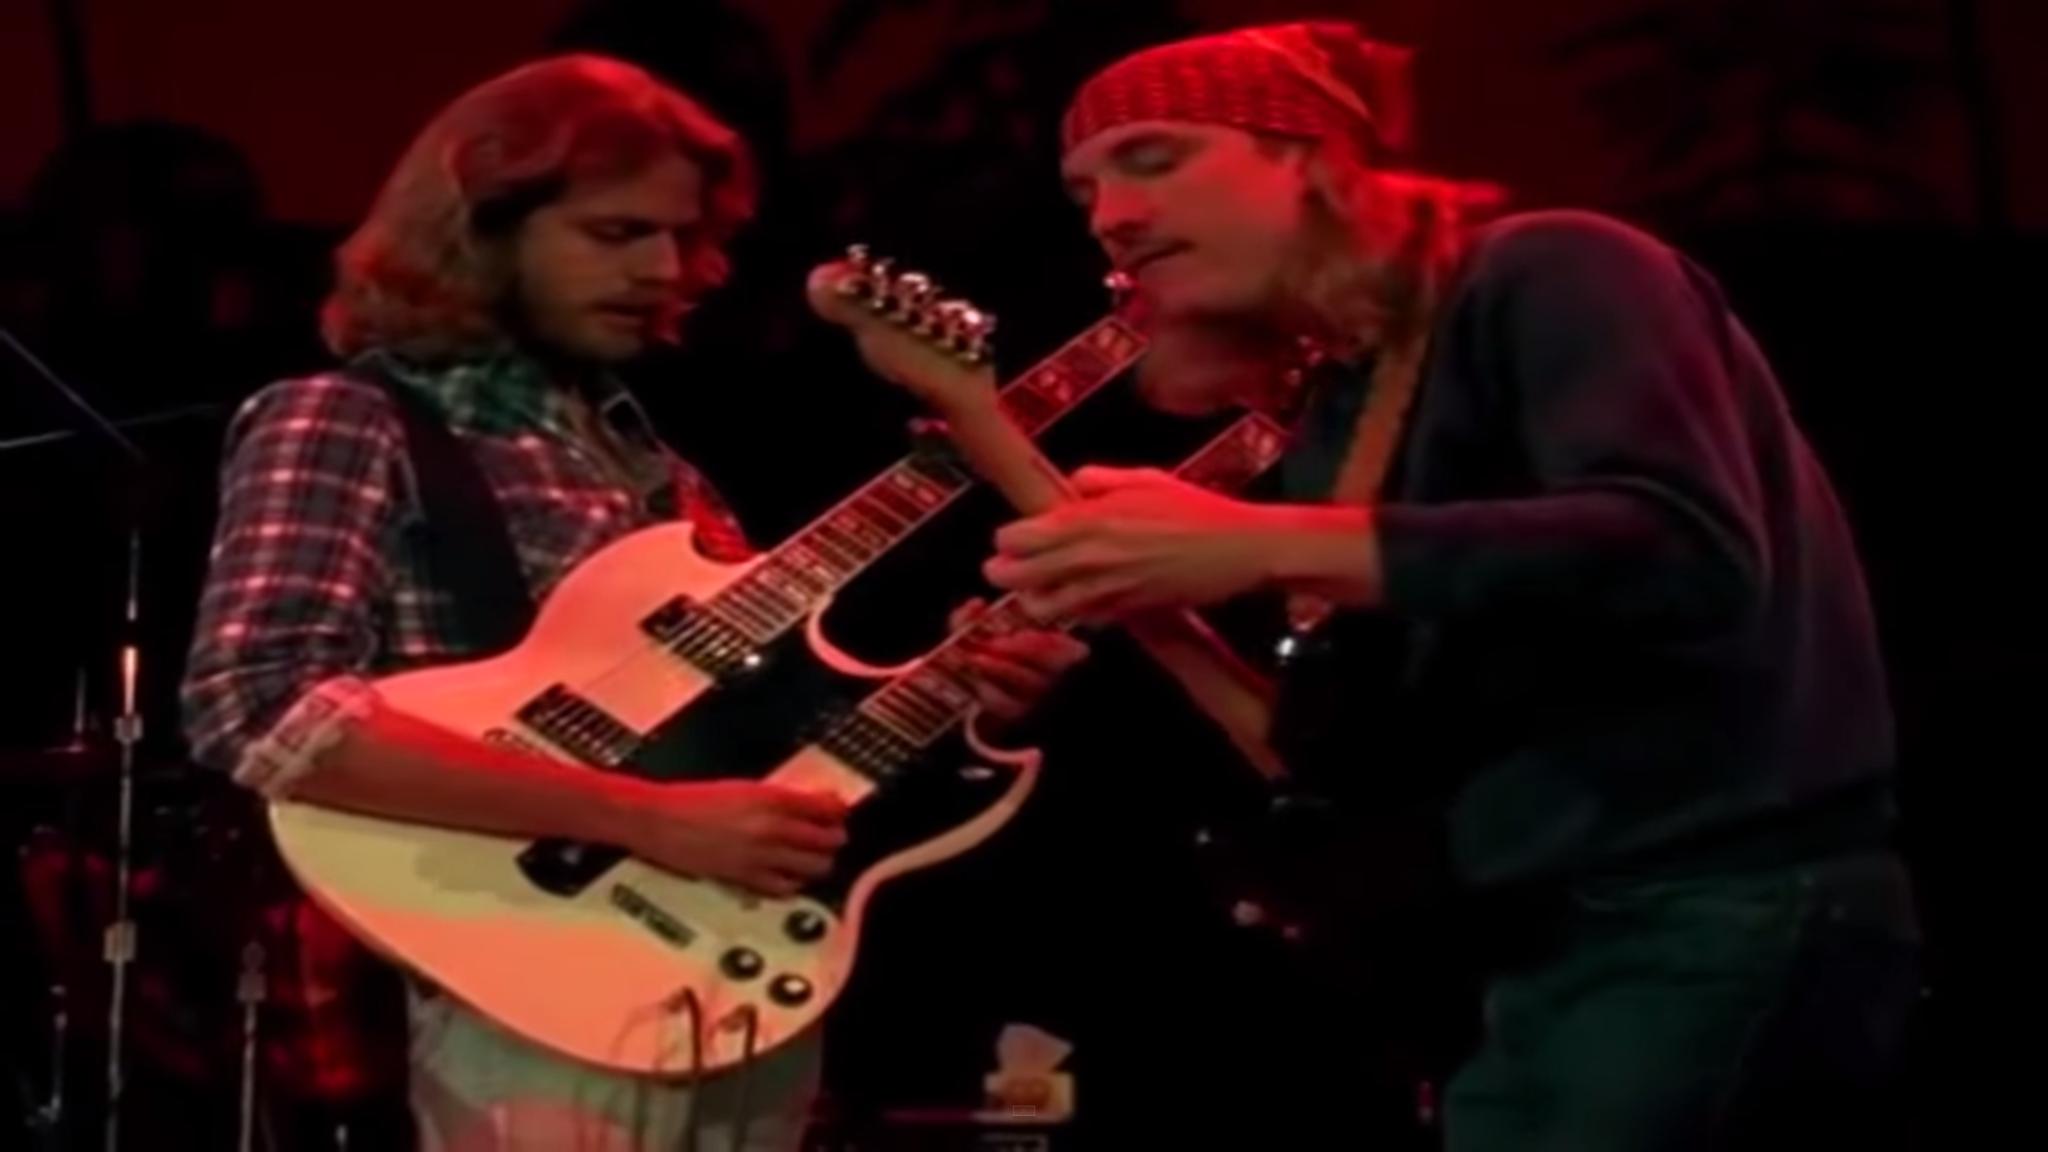 Eagles - Hotel California (LIVE) - Chicago Tribune